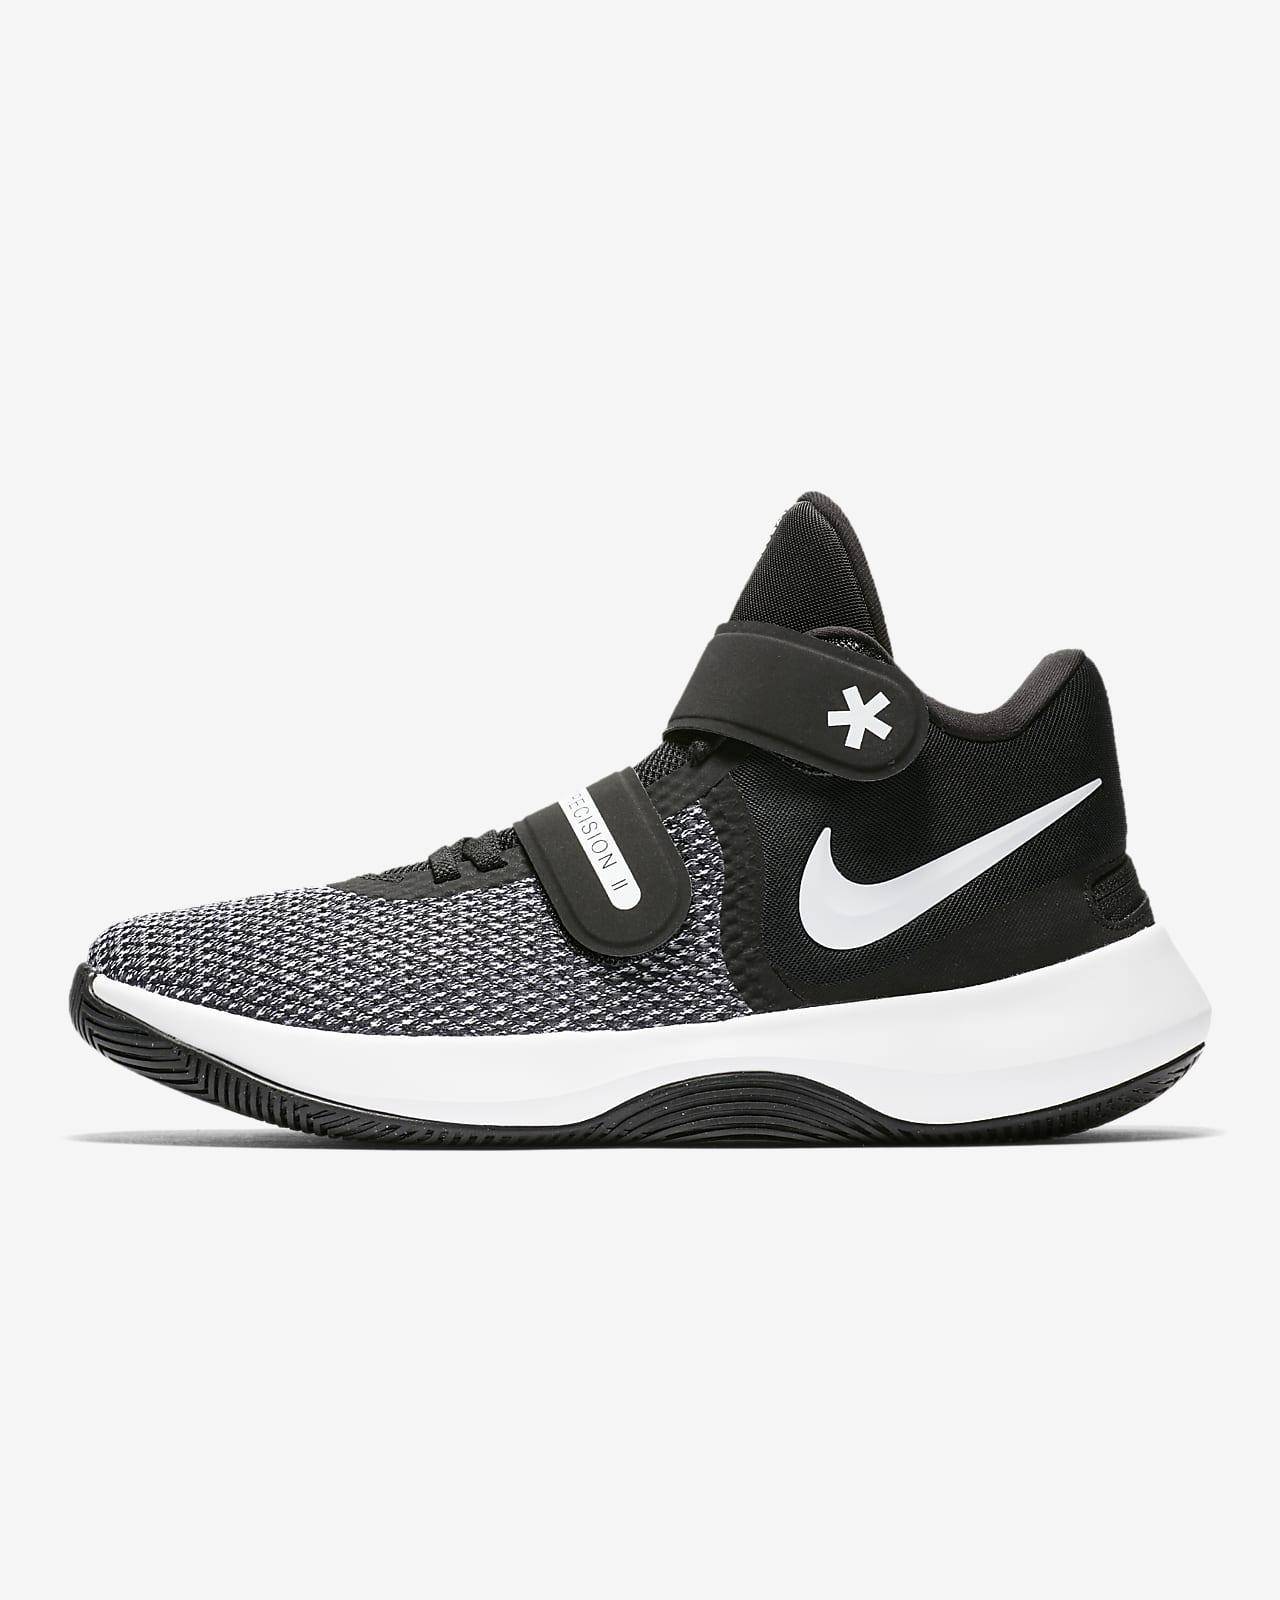 Nike Air Precision II FlyEase Men's